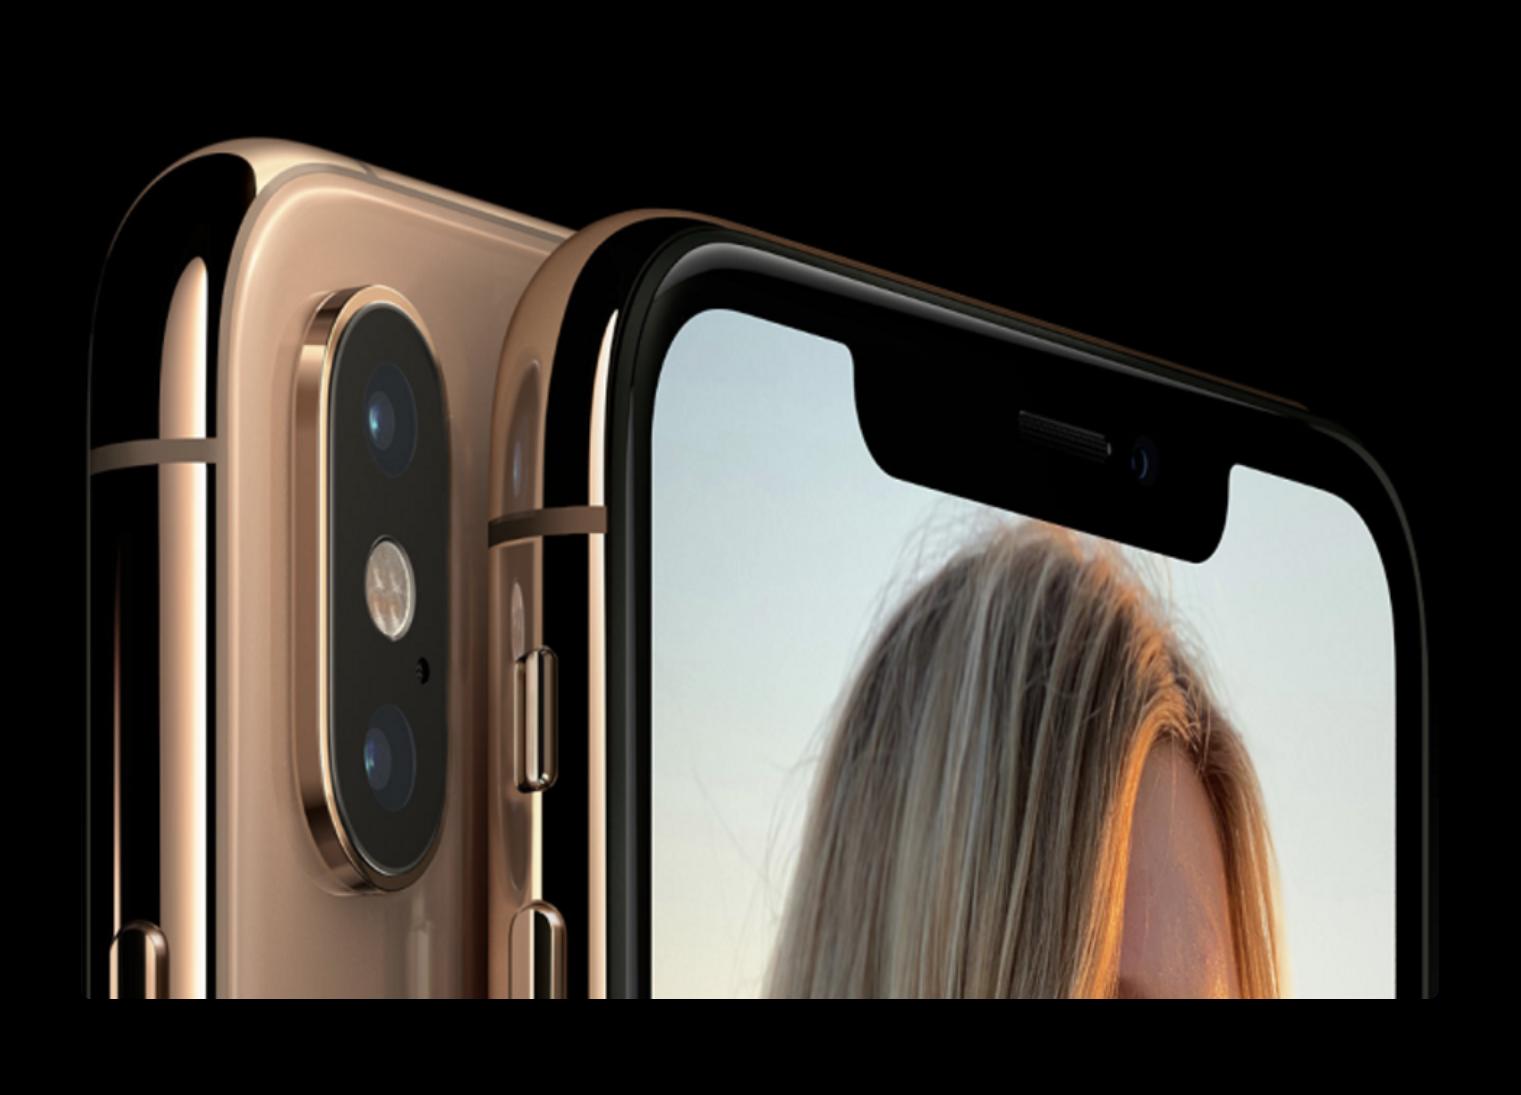 iPhoneの懐中電灯が勝手に点灯しているように思える理由